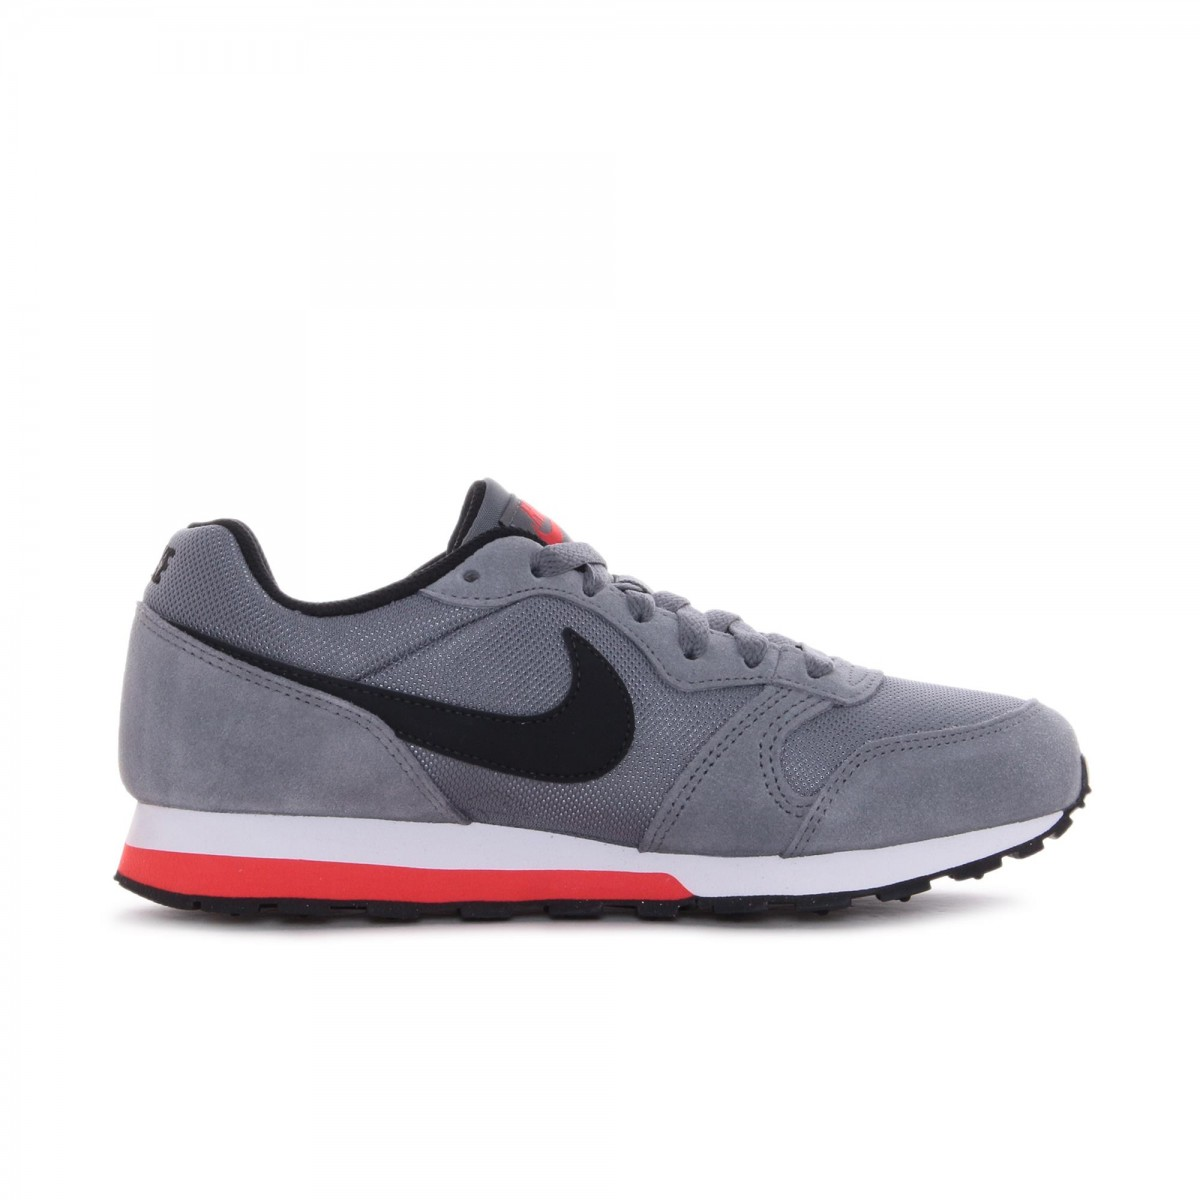 Bizz Store - Tênis Feminino Nike MD Runner 2 GS Corrida 97cbc6df3ef52